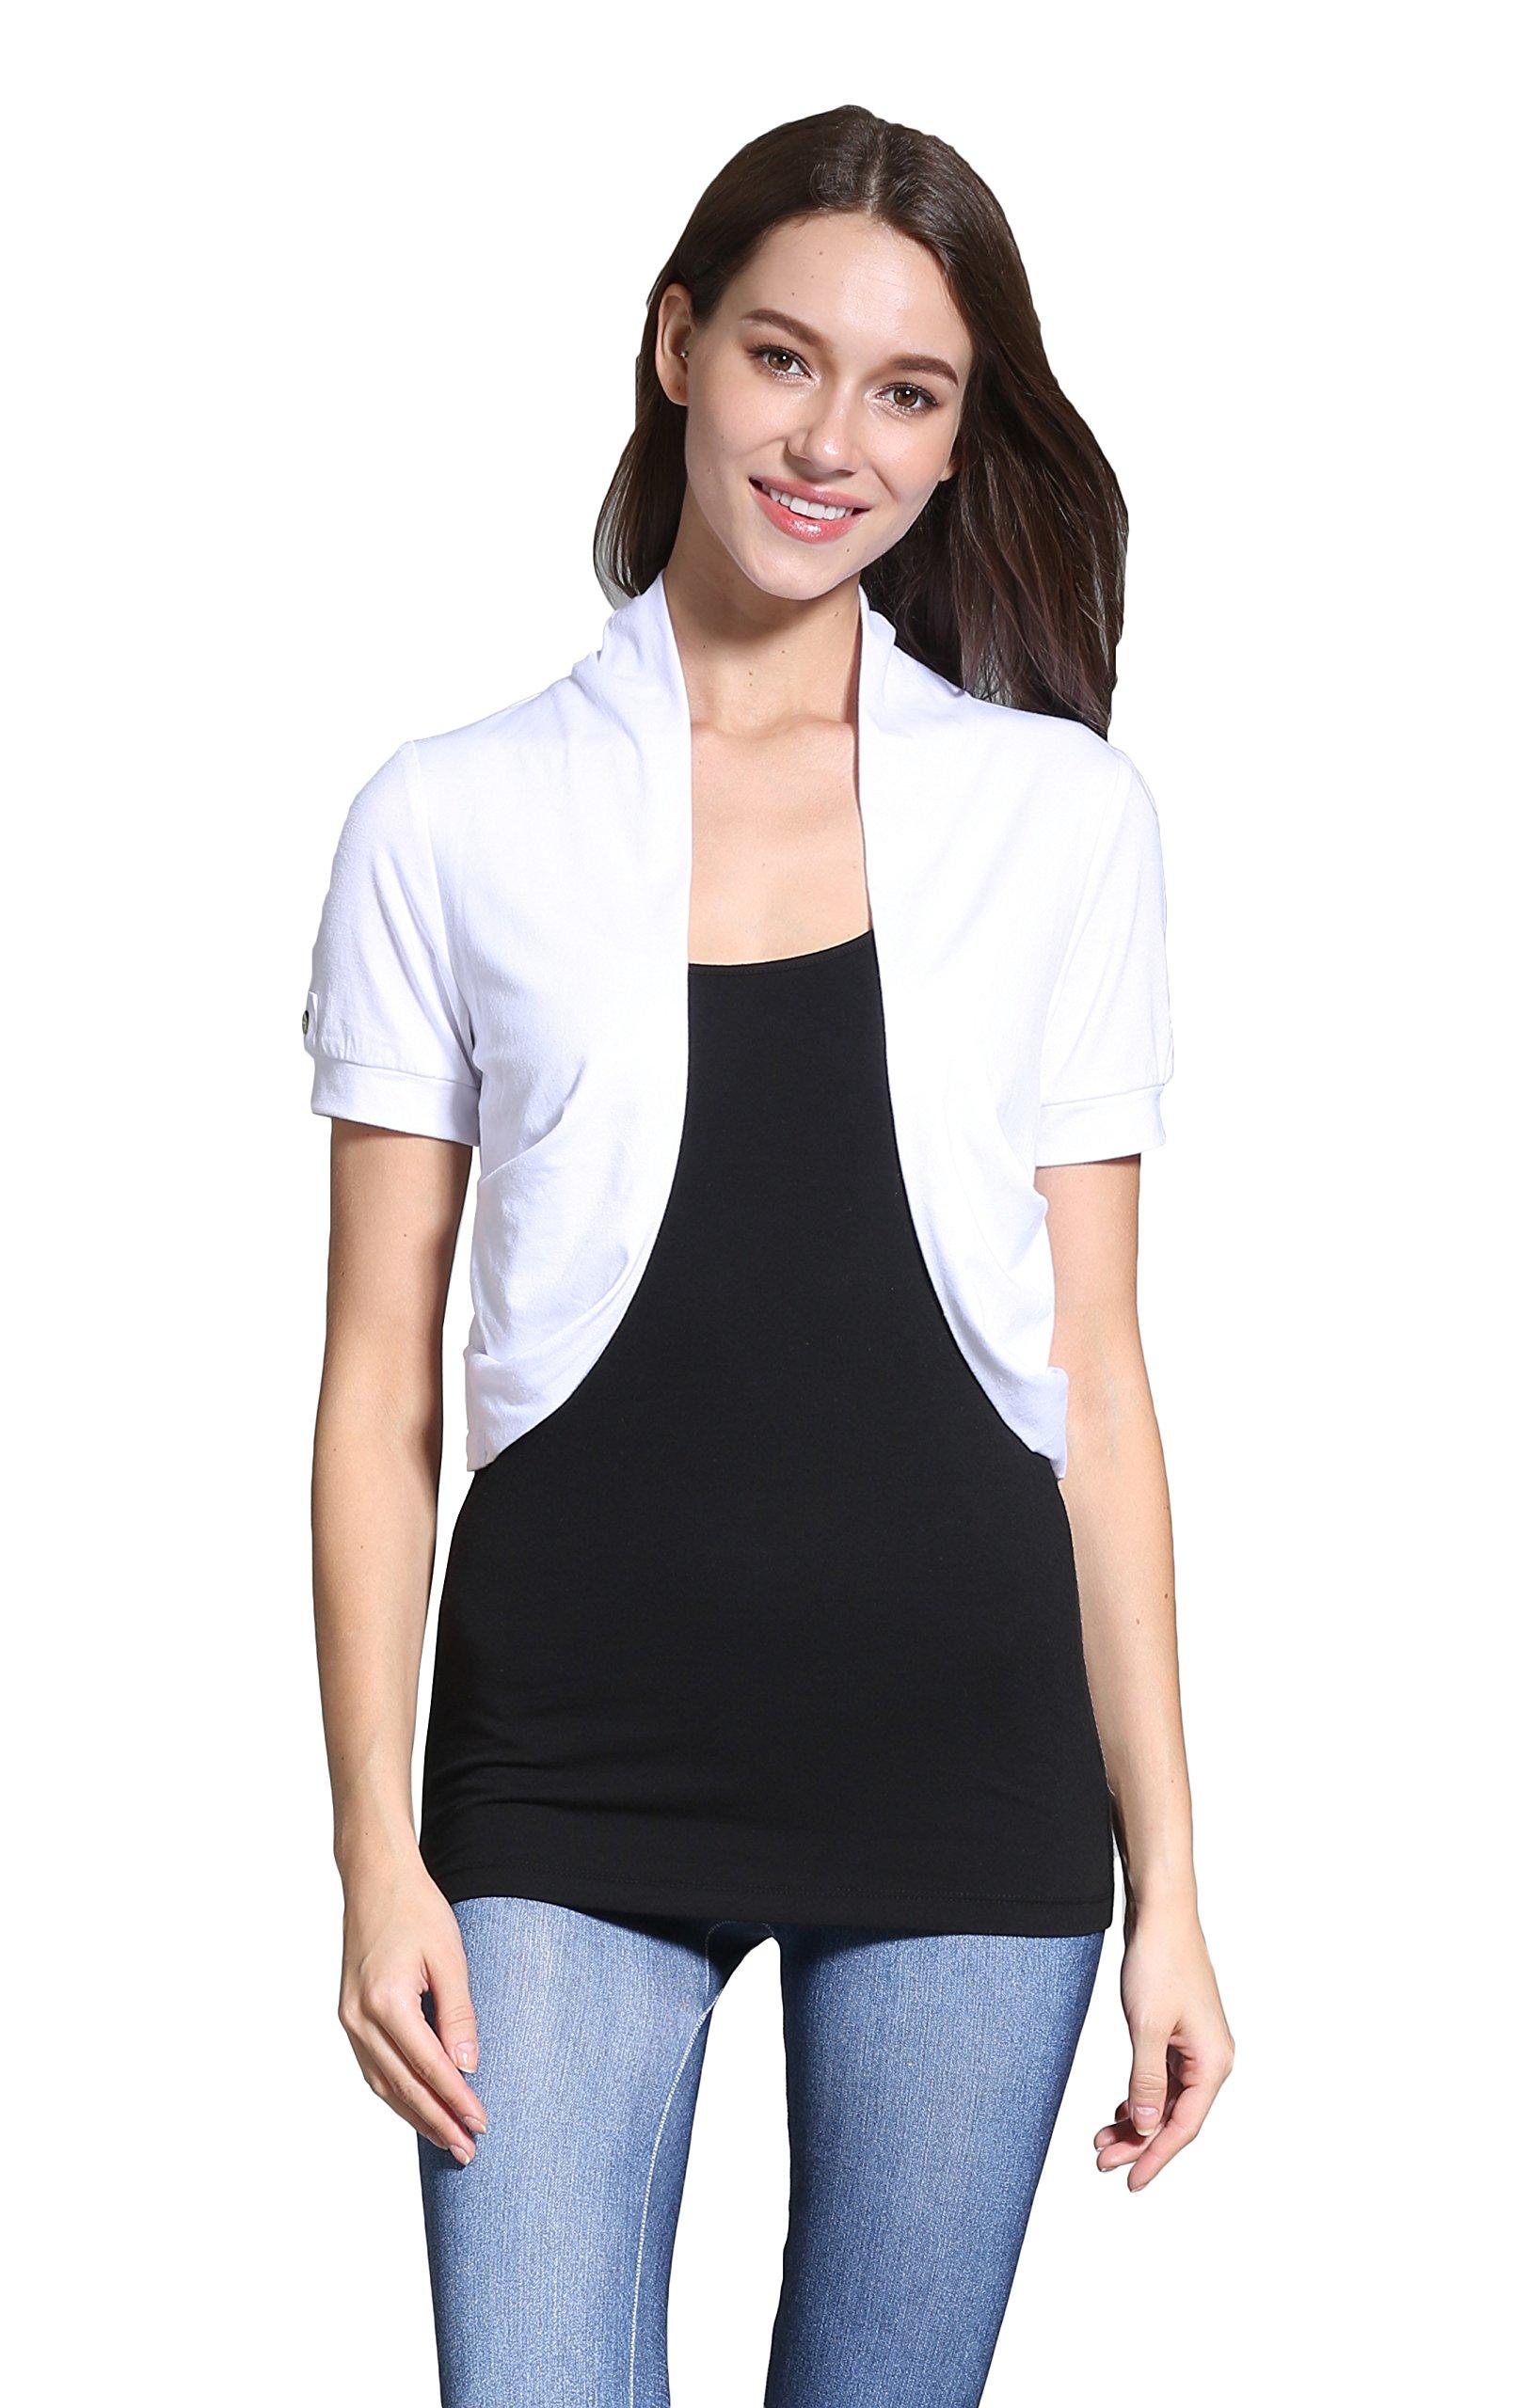 Sofishie Short Sleeve Bolero Shrug - White - Small